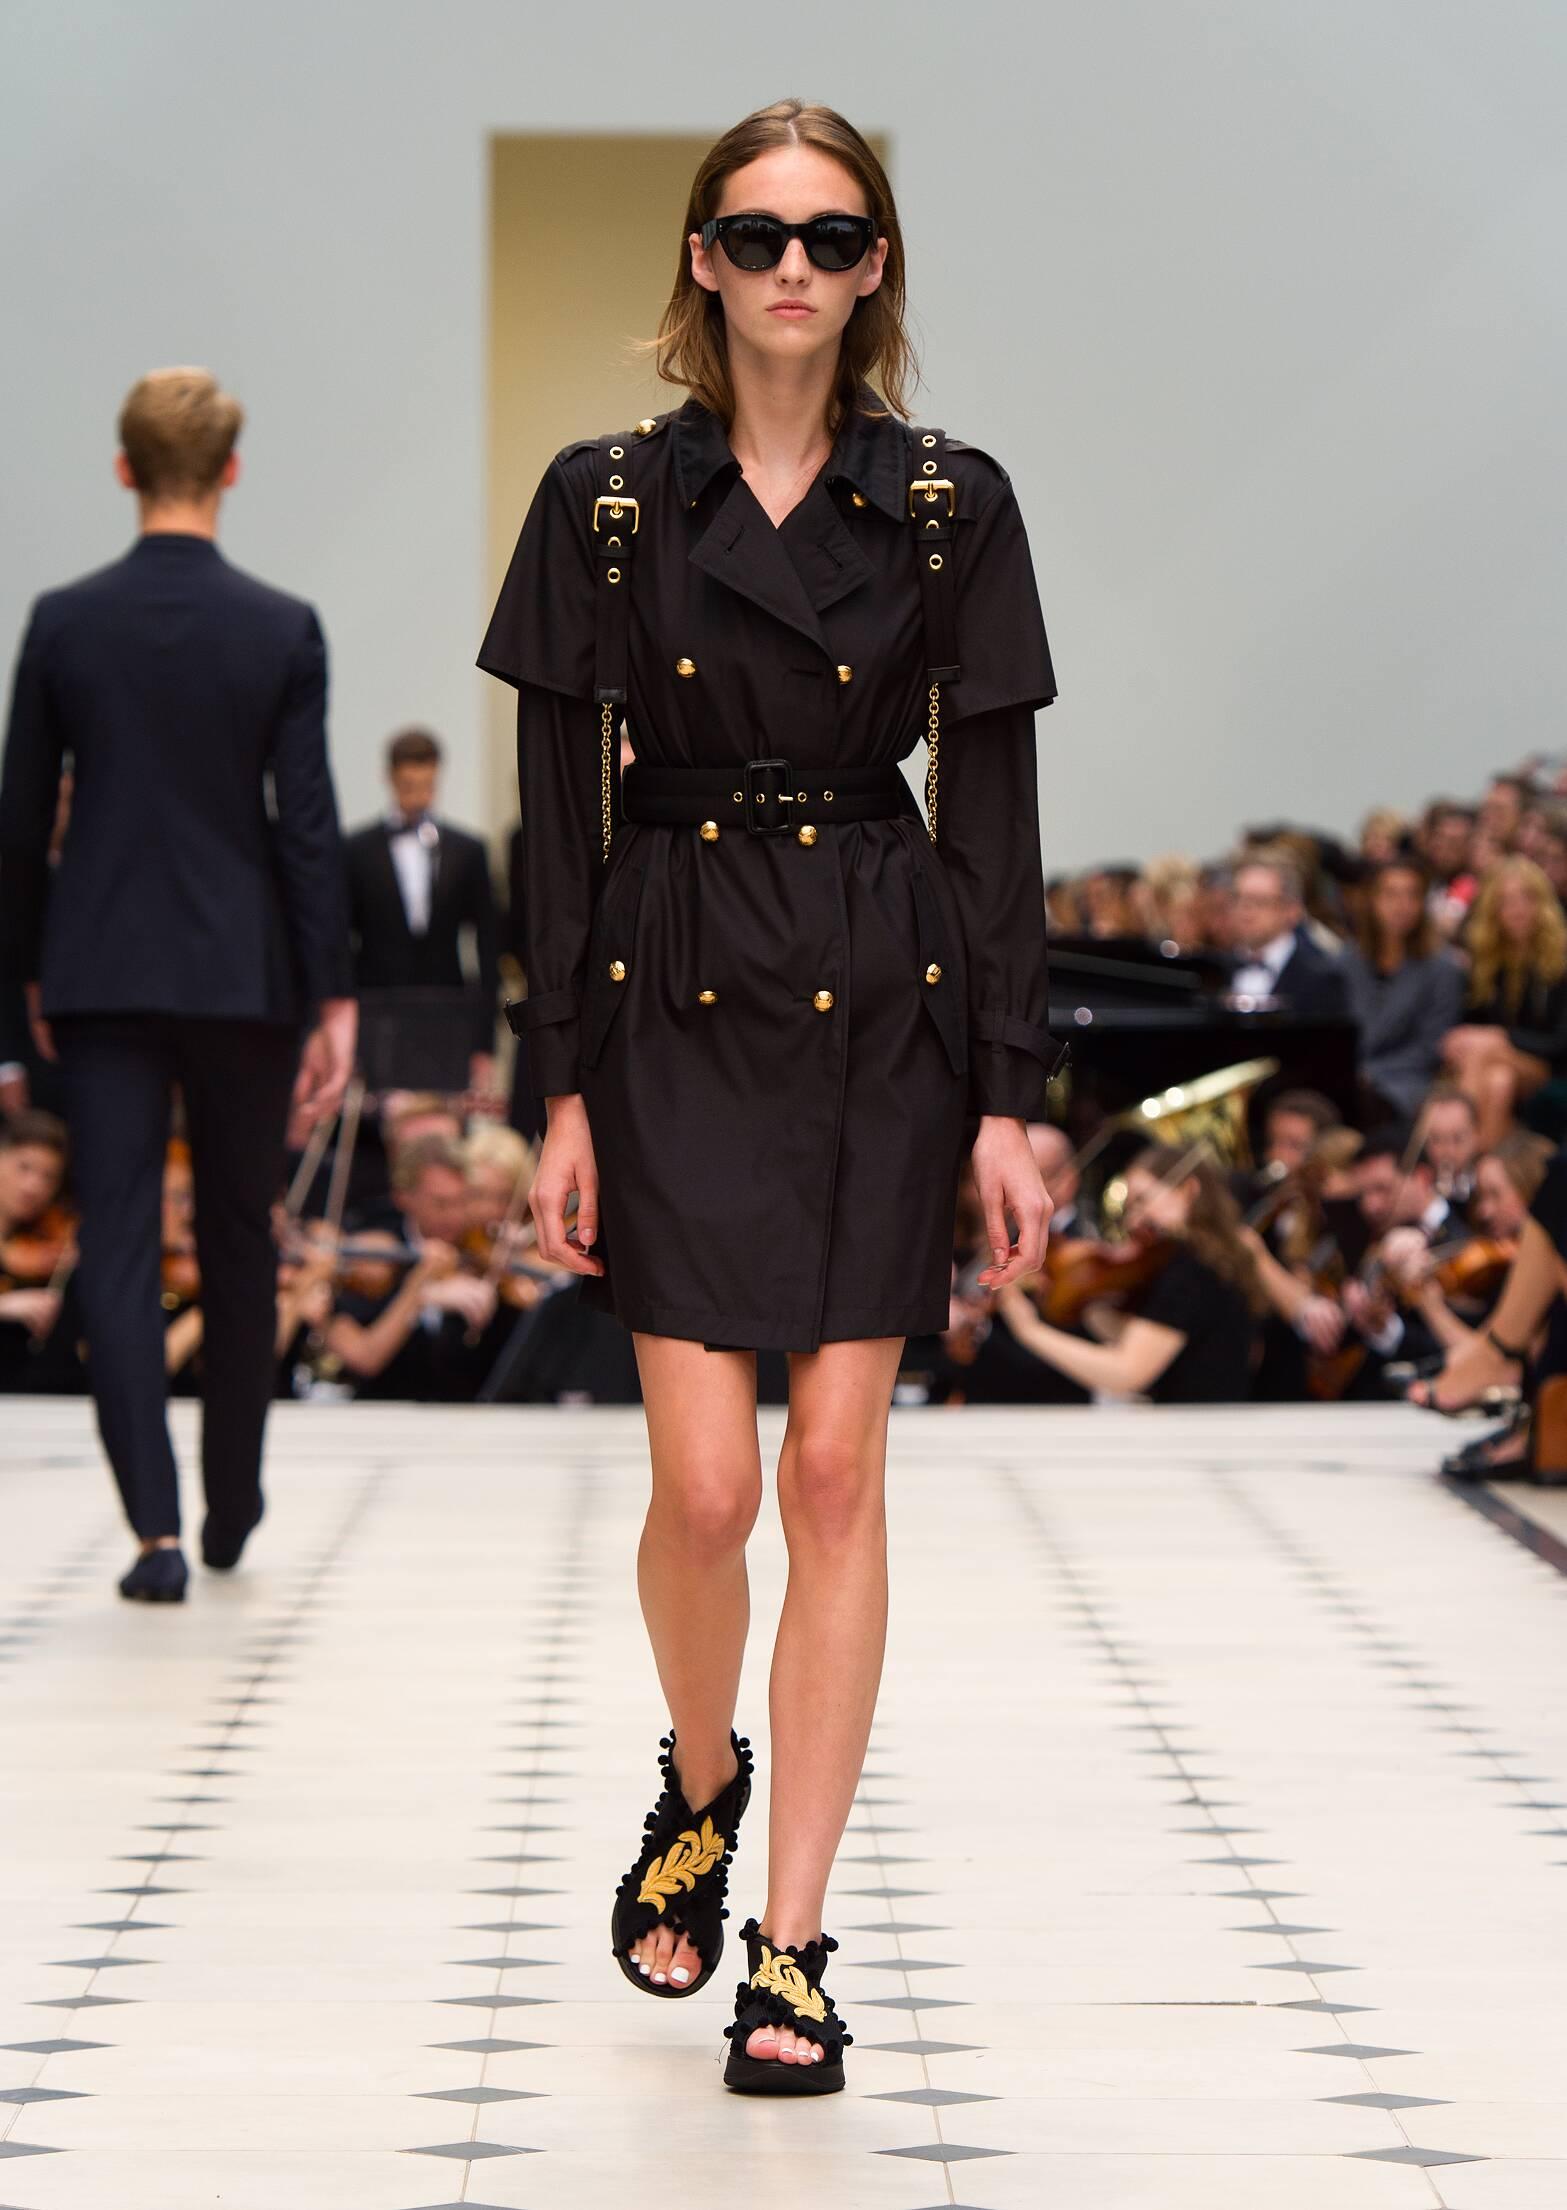 Burberry Prorsum SS 2016 Womenswear